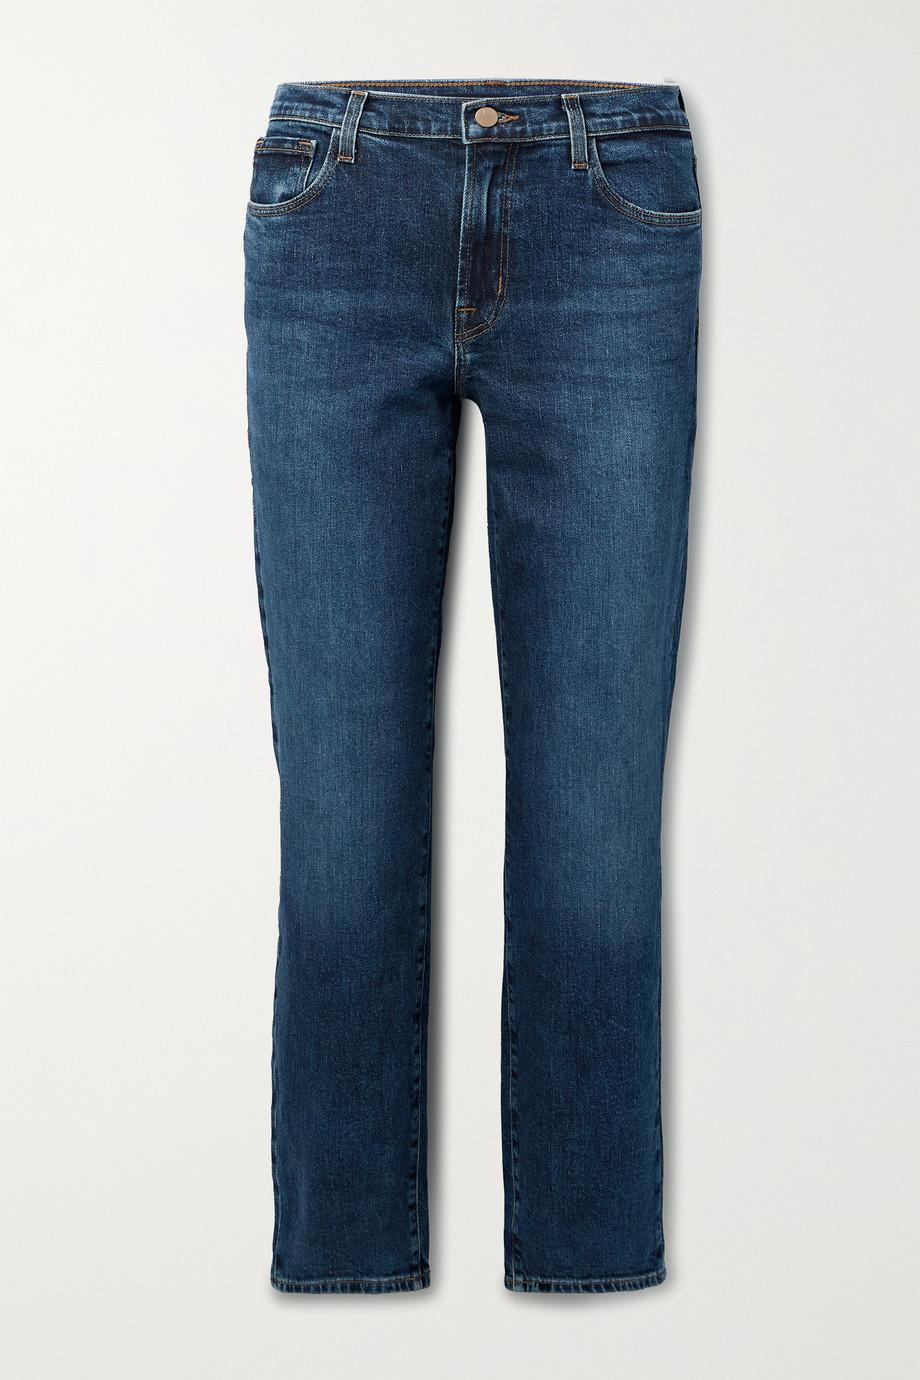 J Brand Adele mid-rise straight-leg jeans